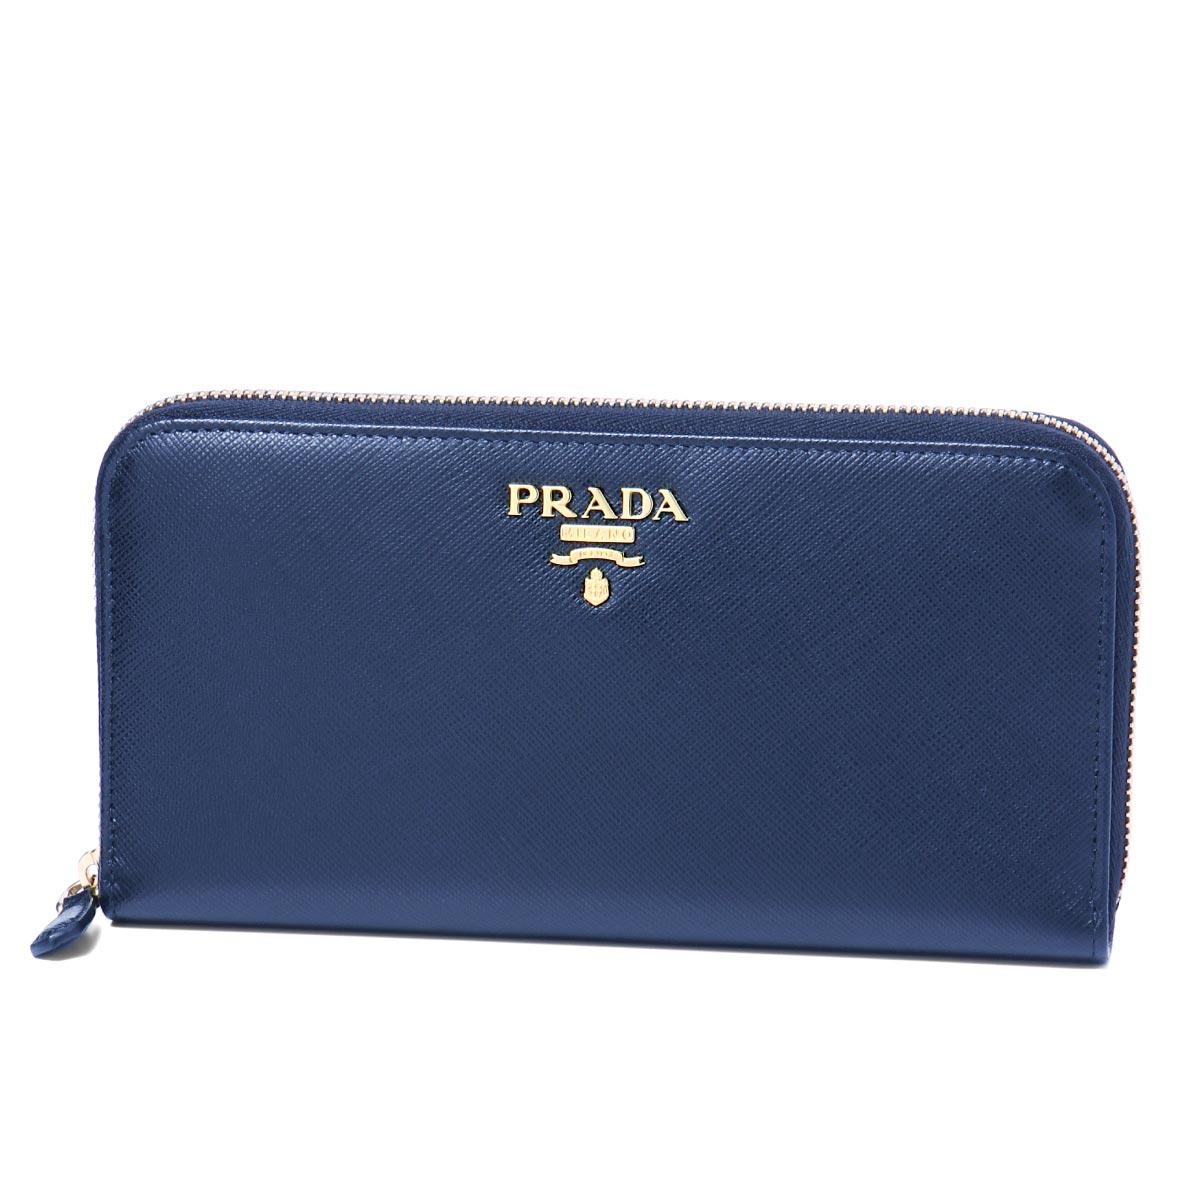 7b9050ca331a Dark blue 1ML506 QWA F 0016, large zip around wallet BLUETTE, Prada PRADA  SAFFIANO ...